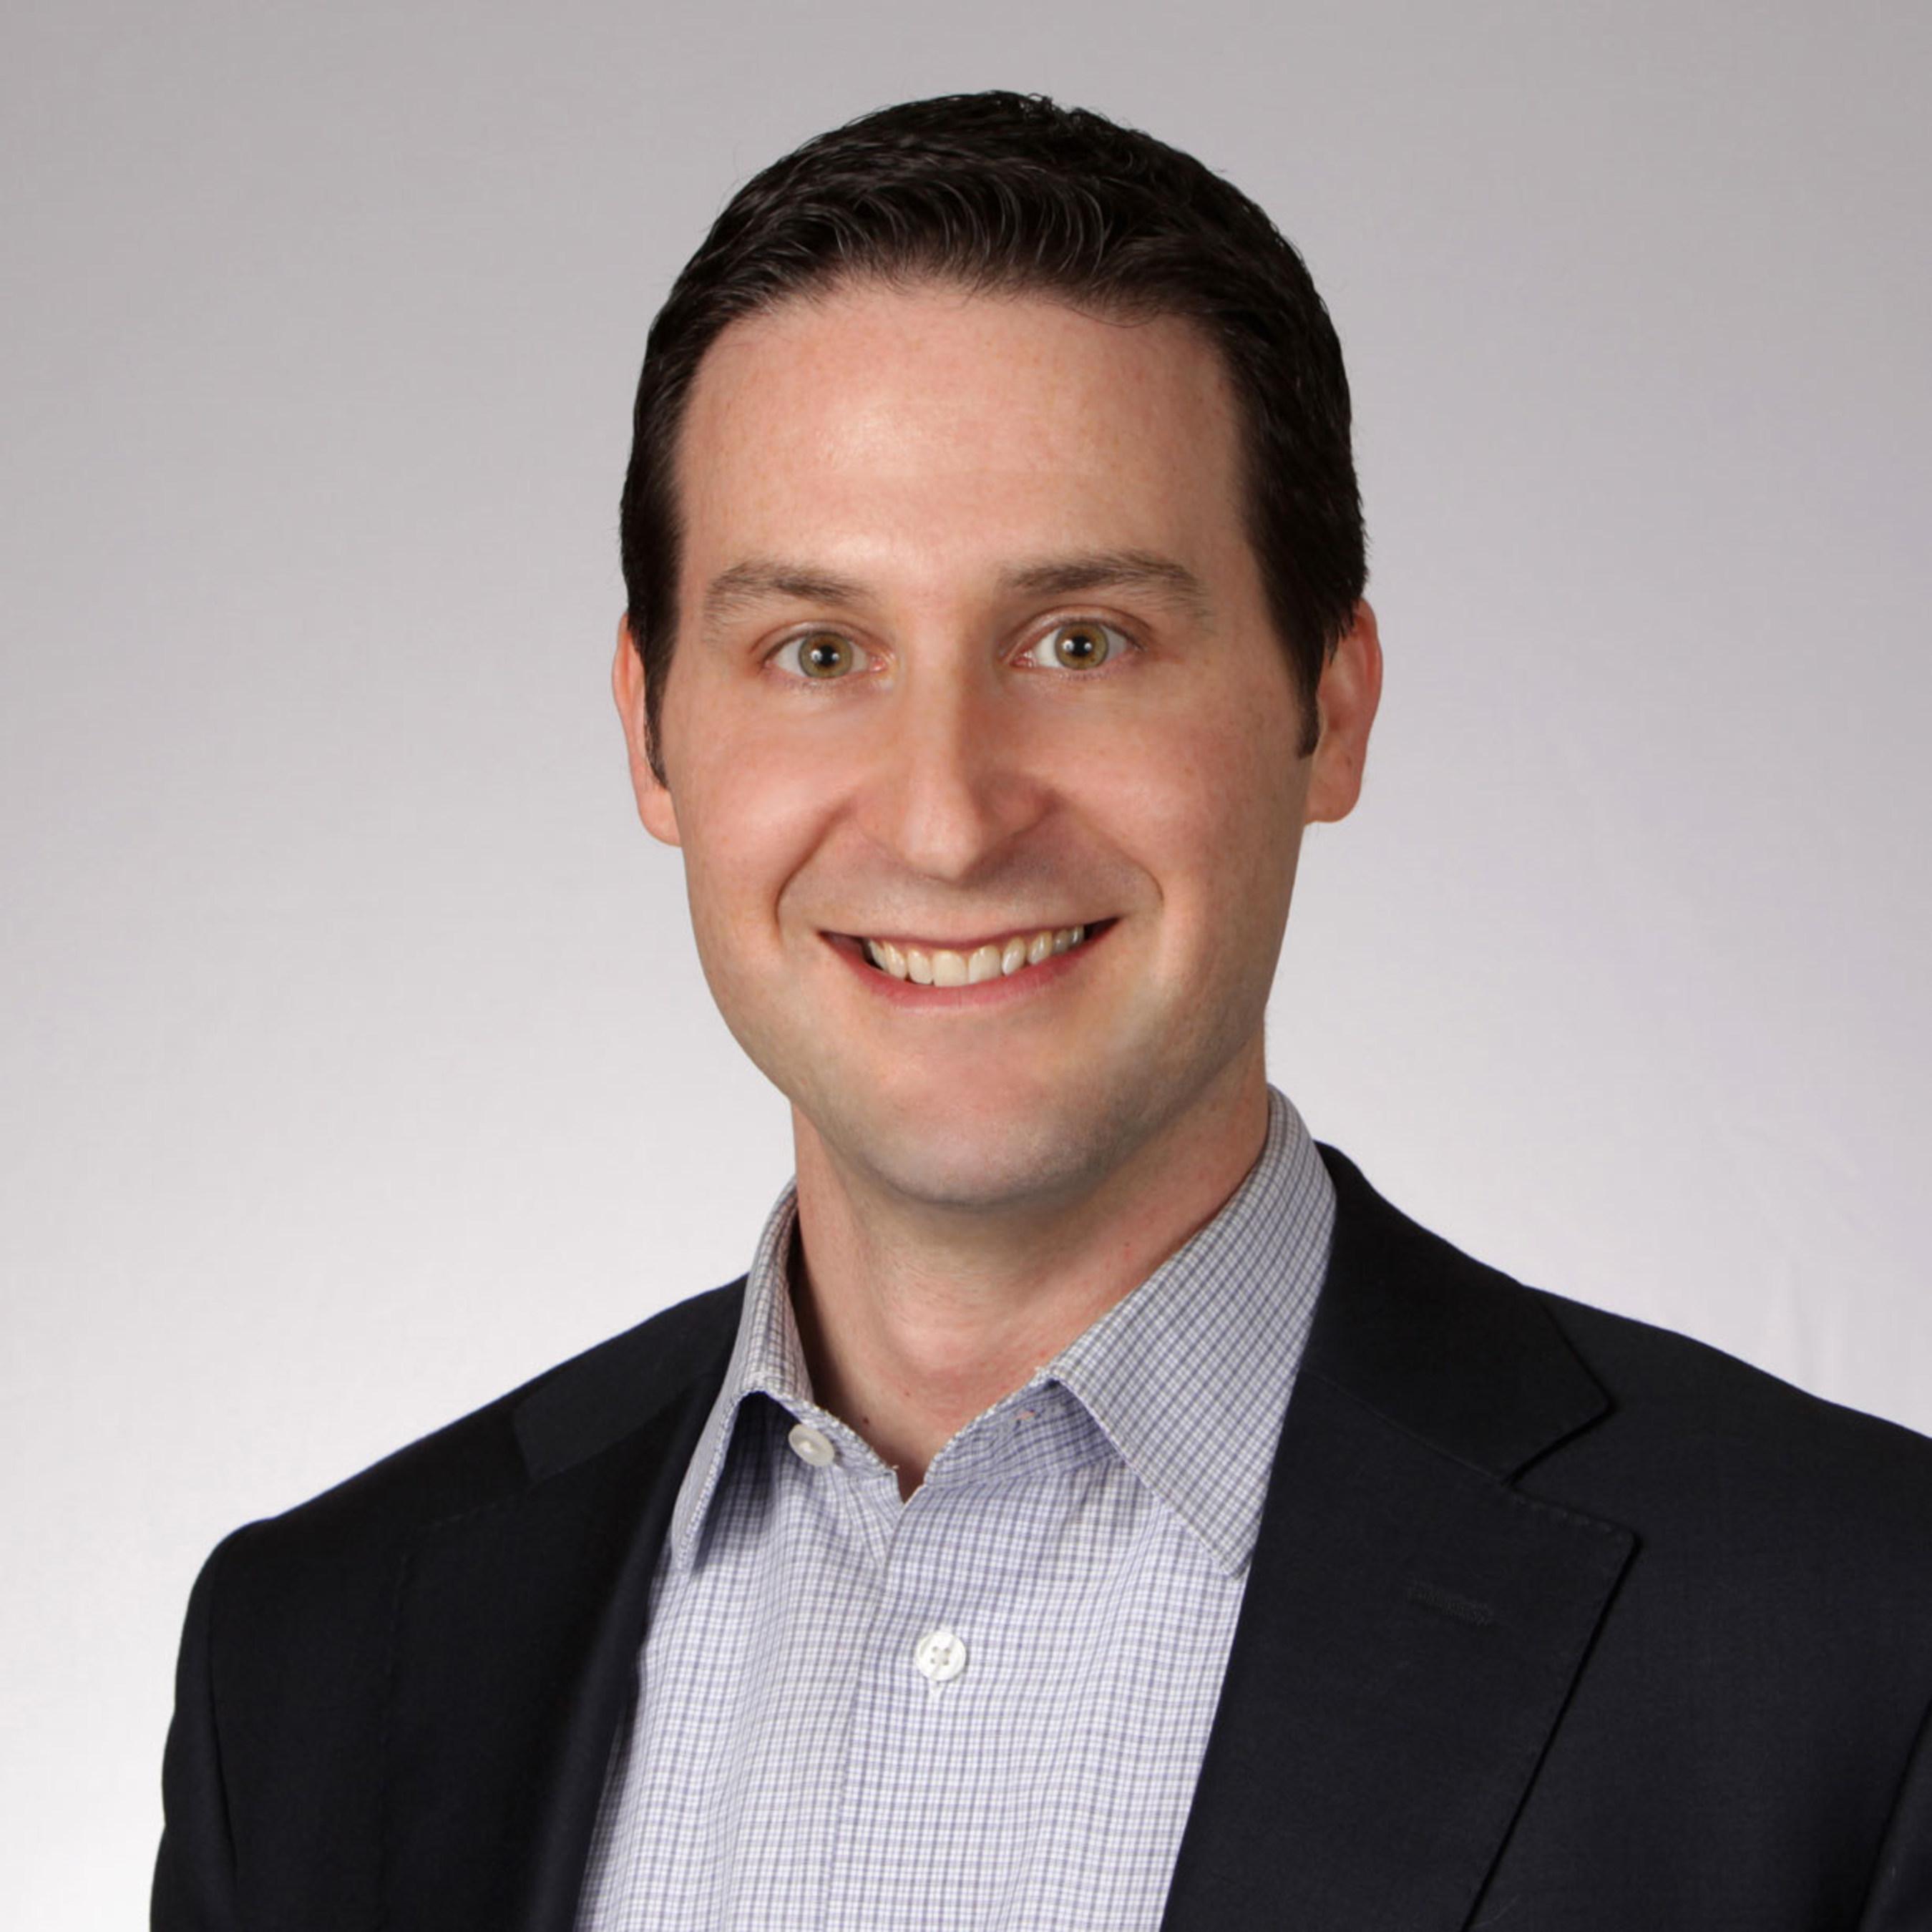 Gabriel Poppie, Head of Sales, Central Region, Swiss Re Corporate Solutions